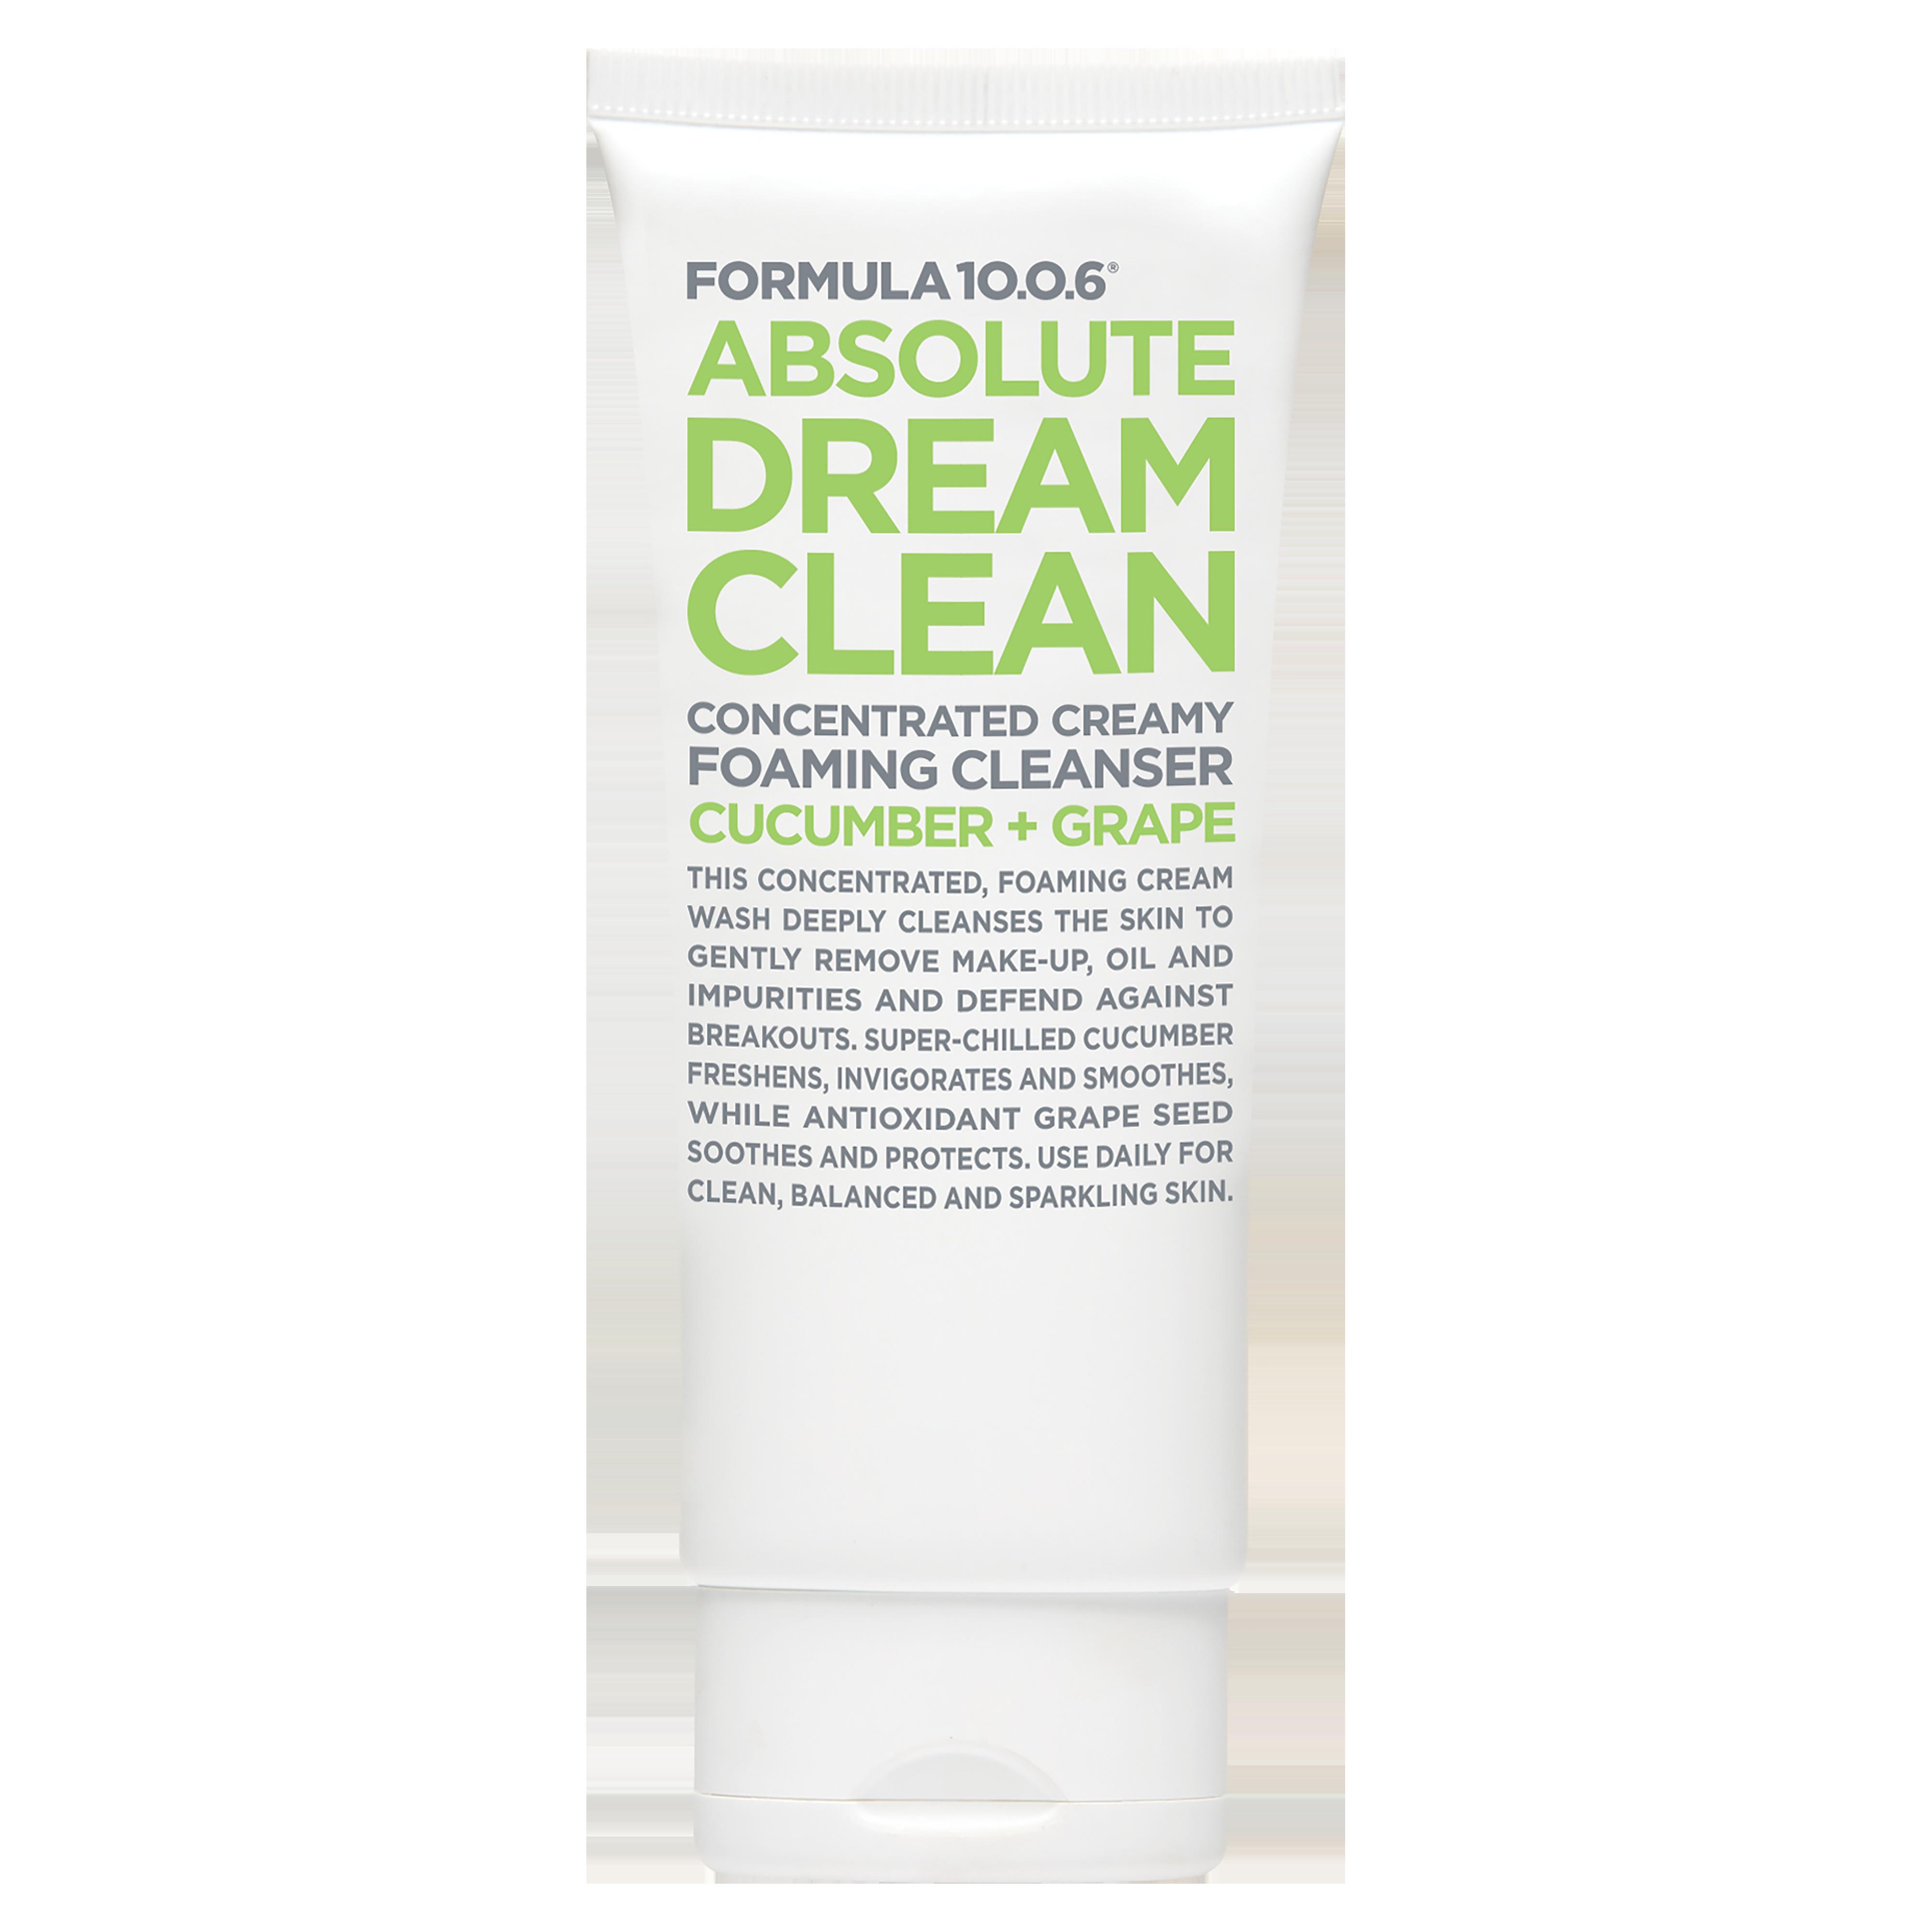 Absolute Dream Clean Foaming Cleanser